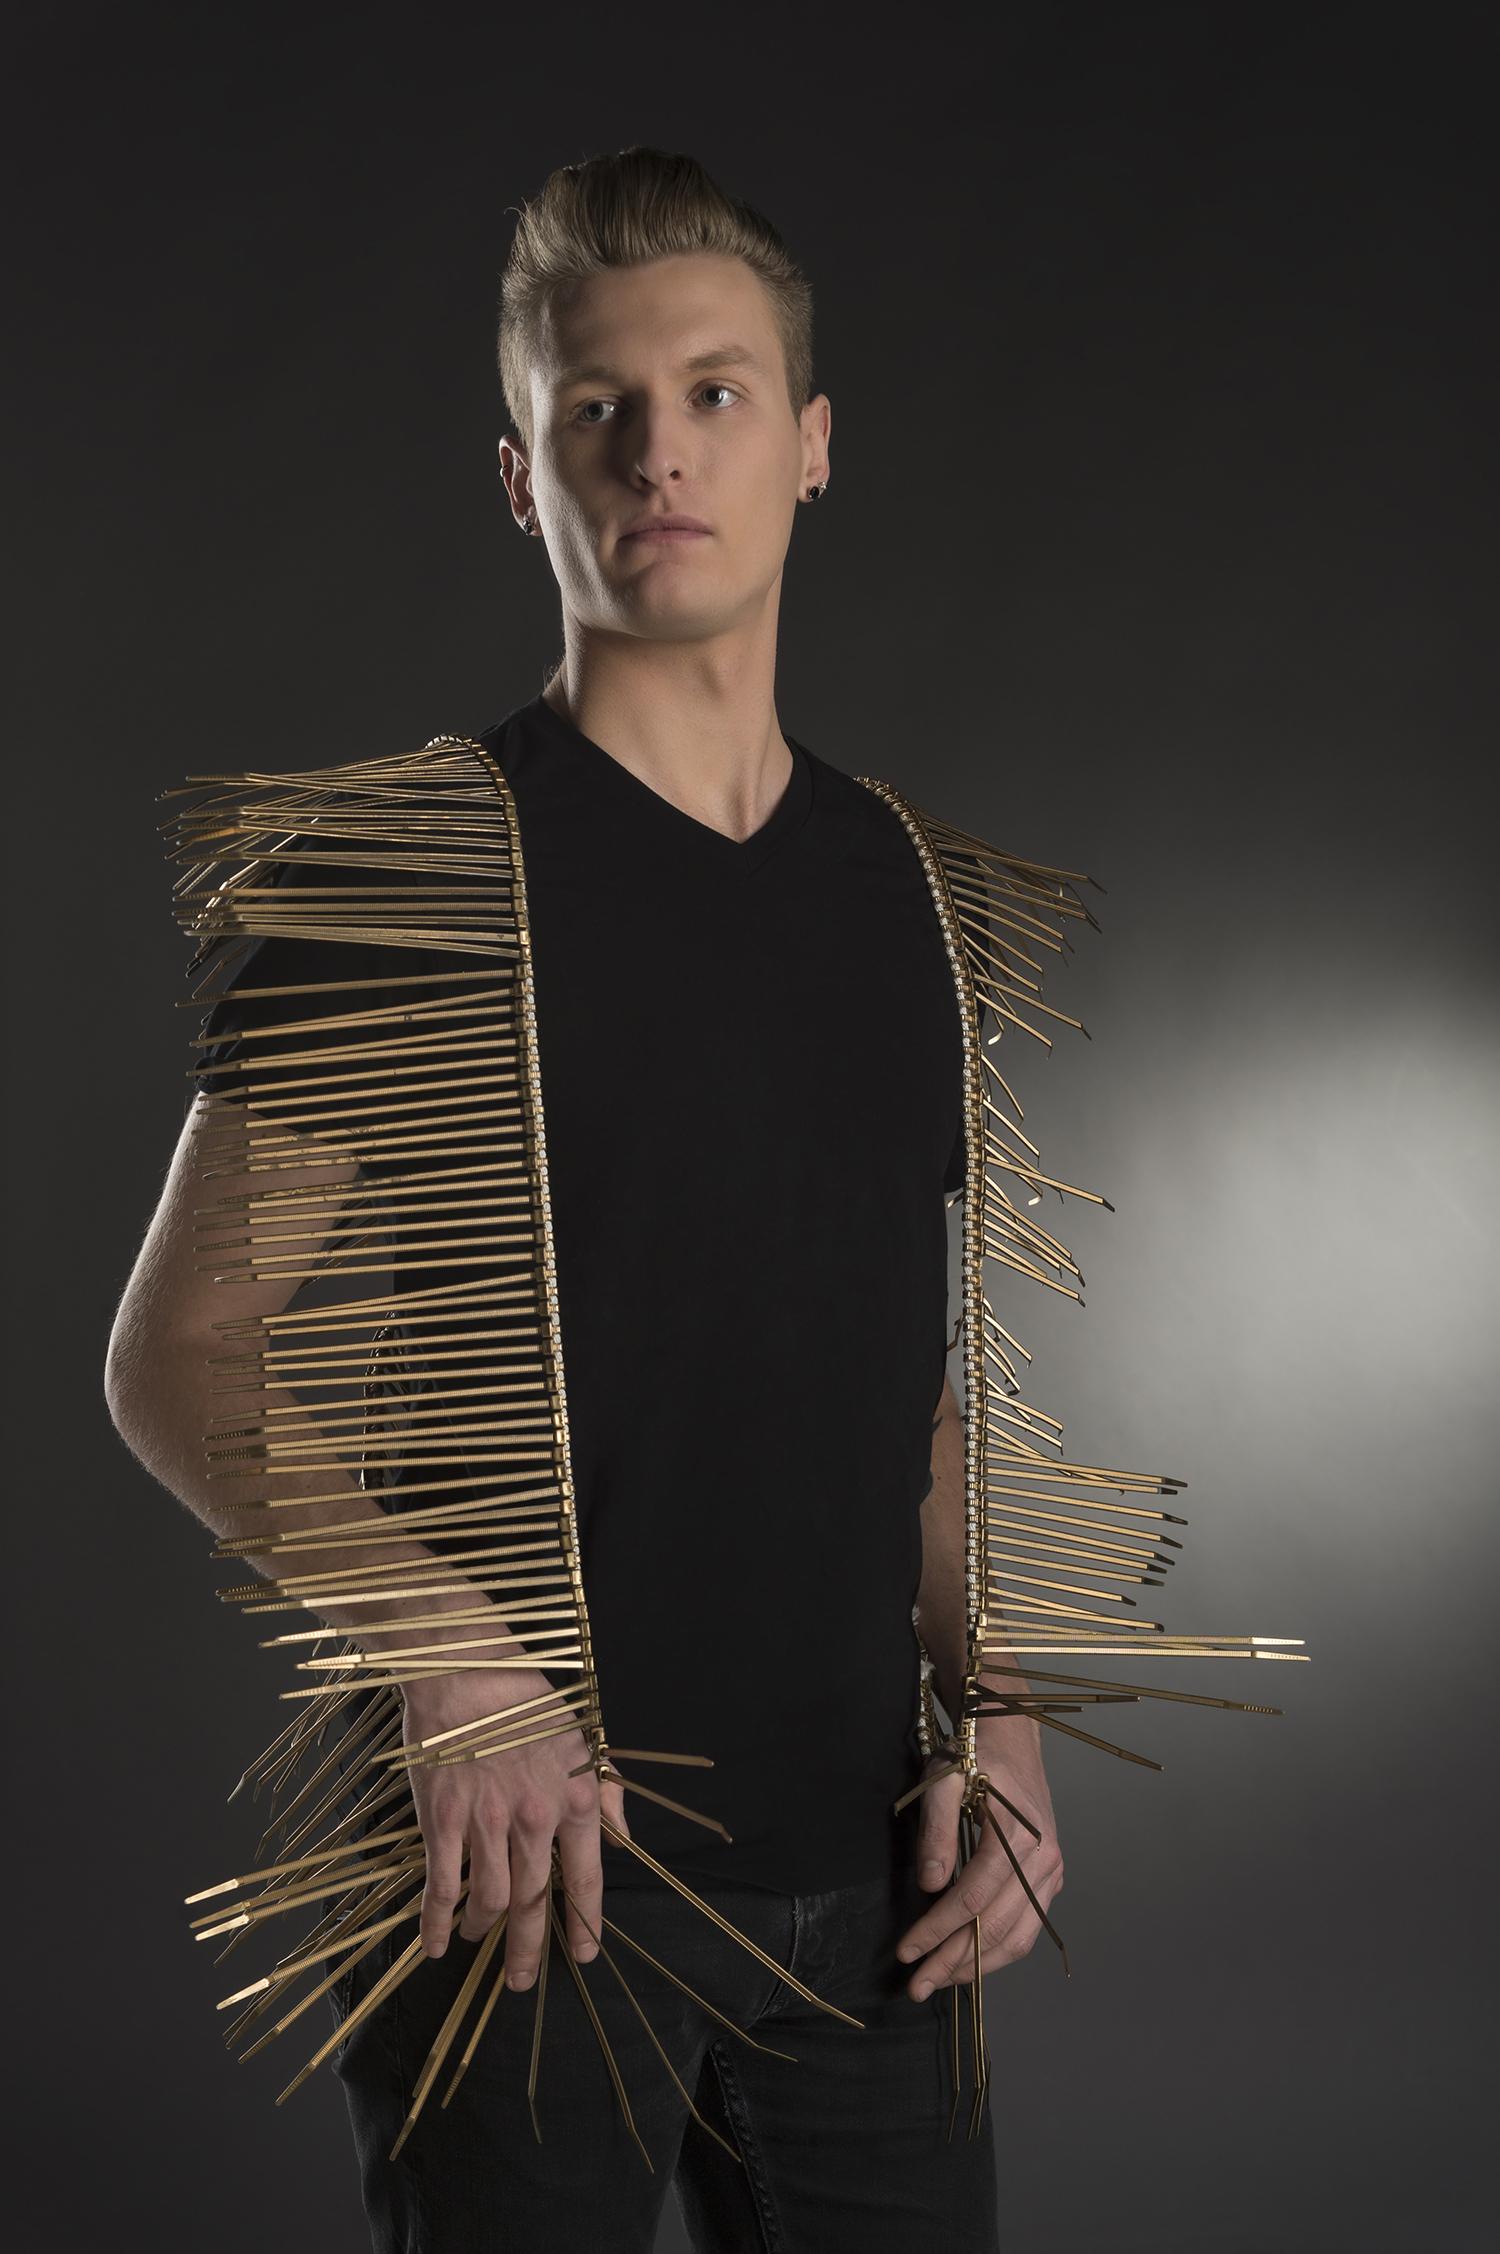 A fashion piece designed by Brett Baker